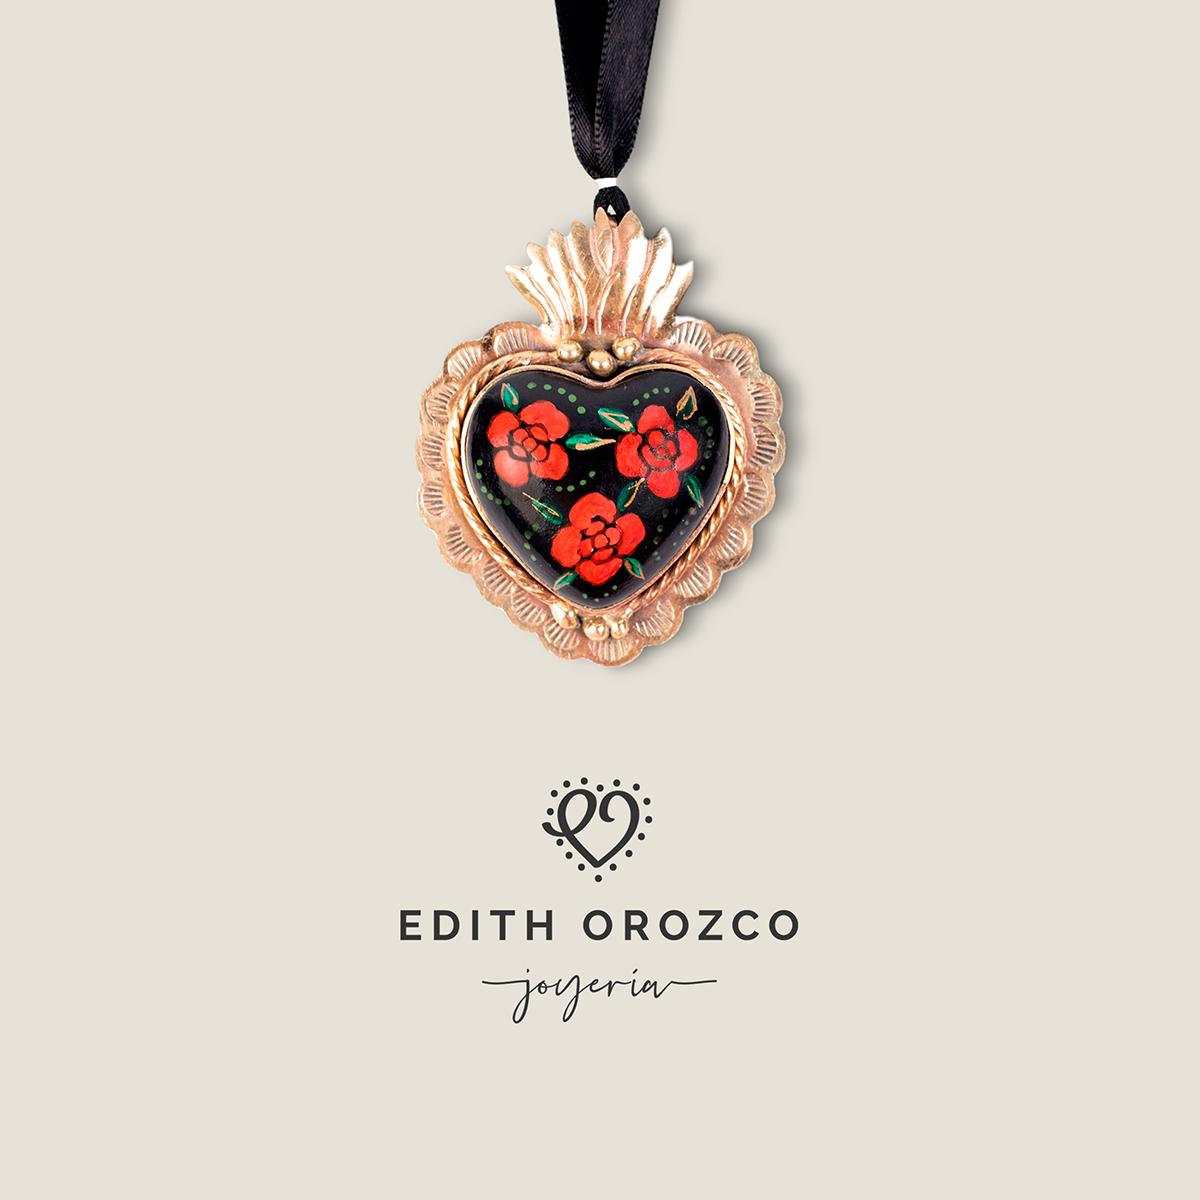 corazon edith orozco 2